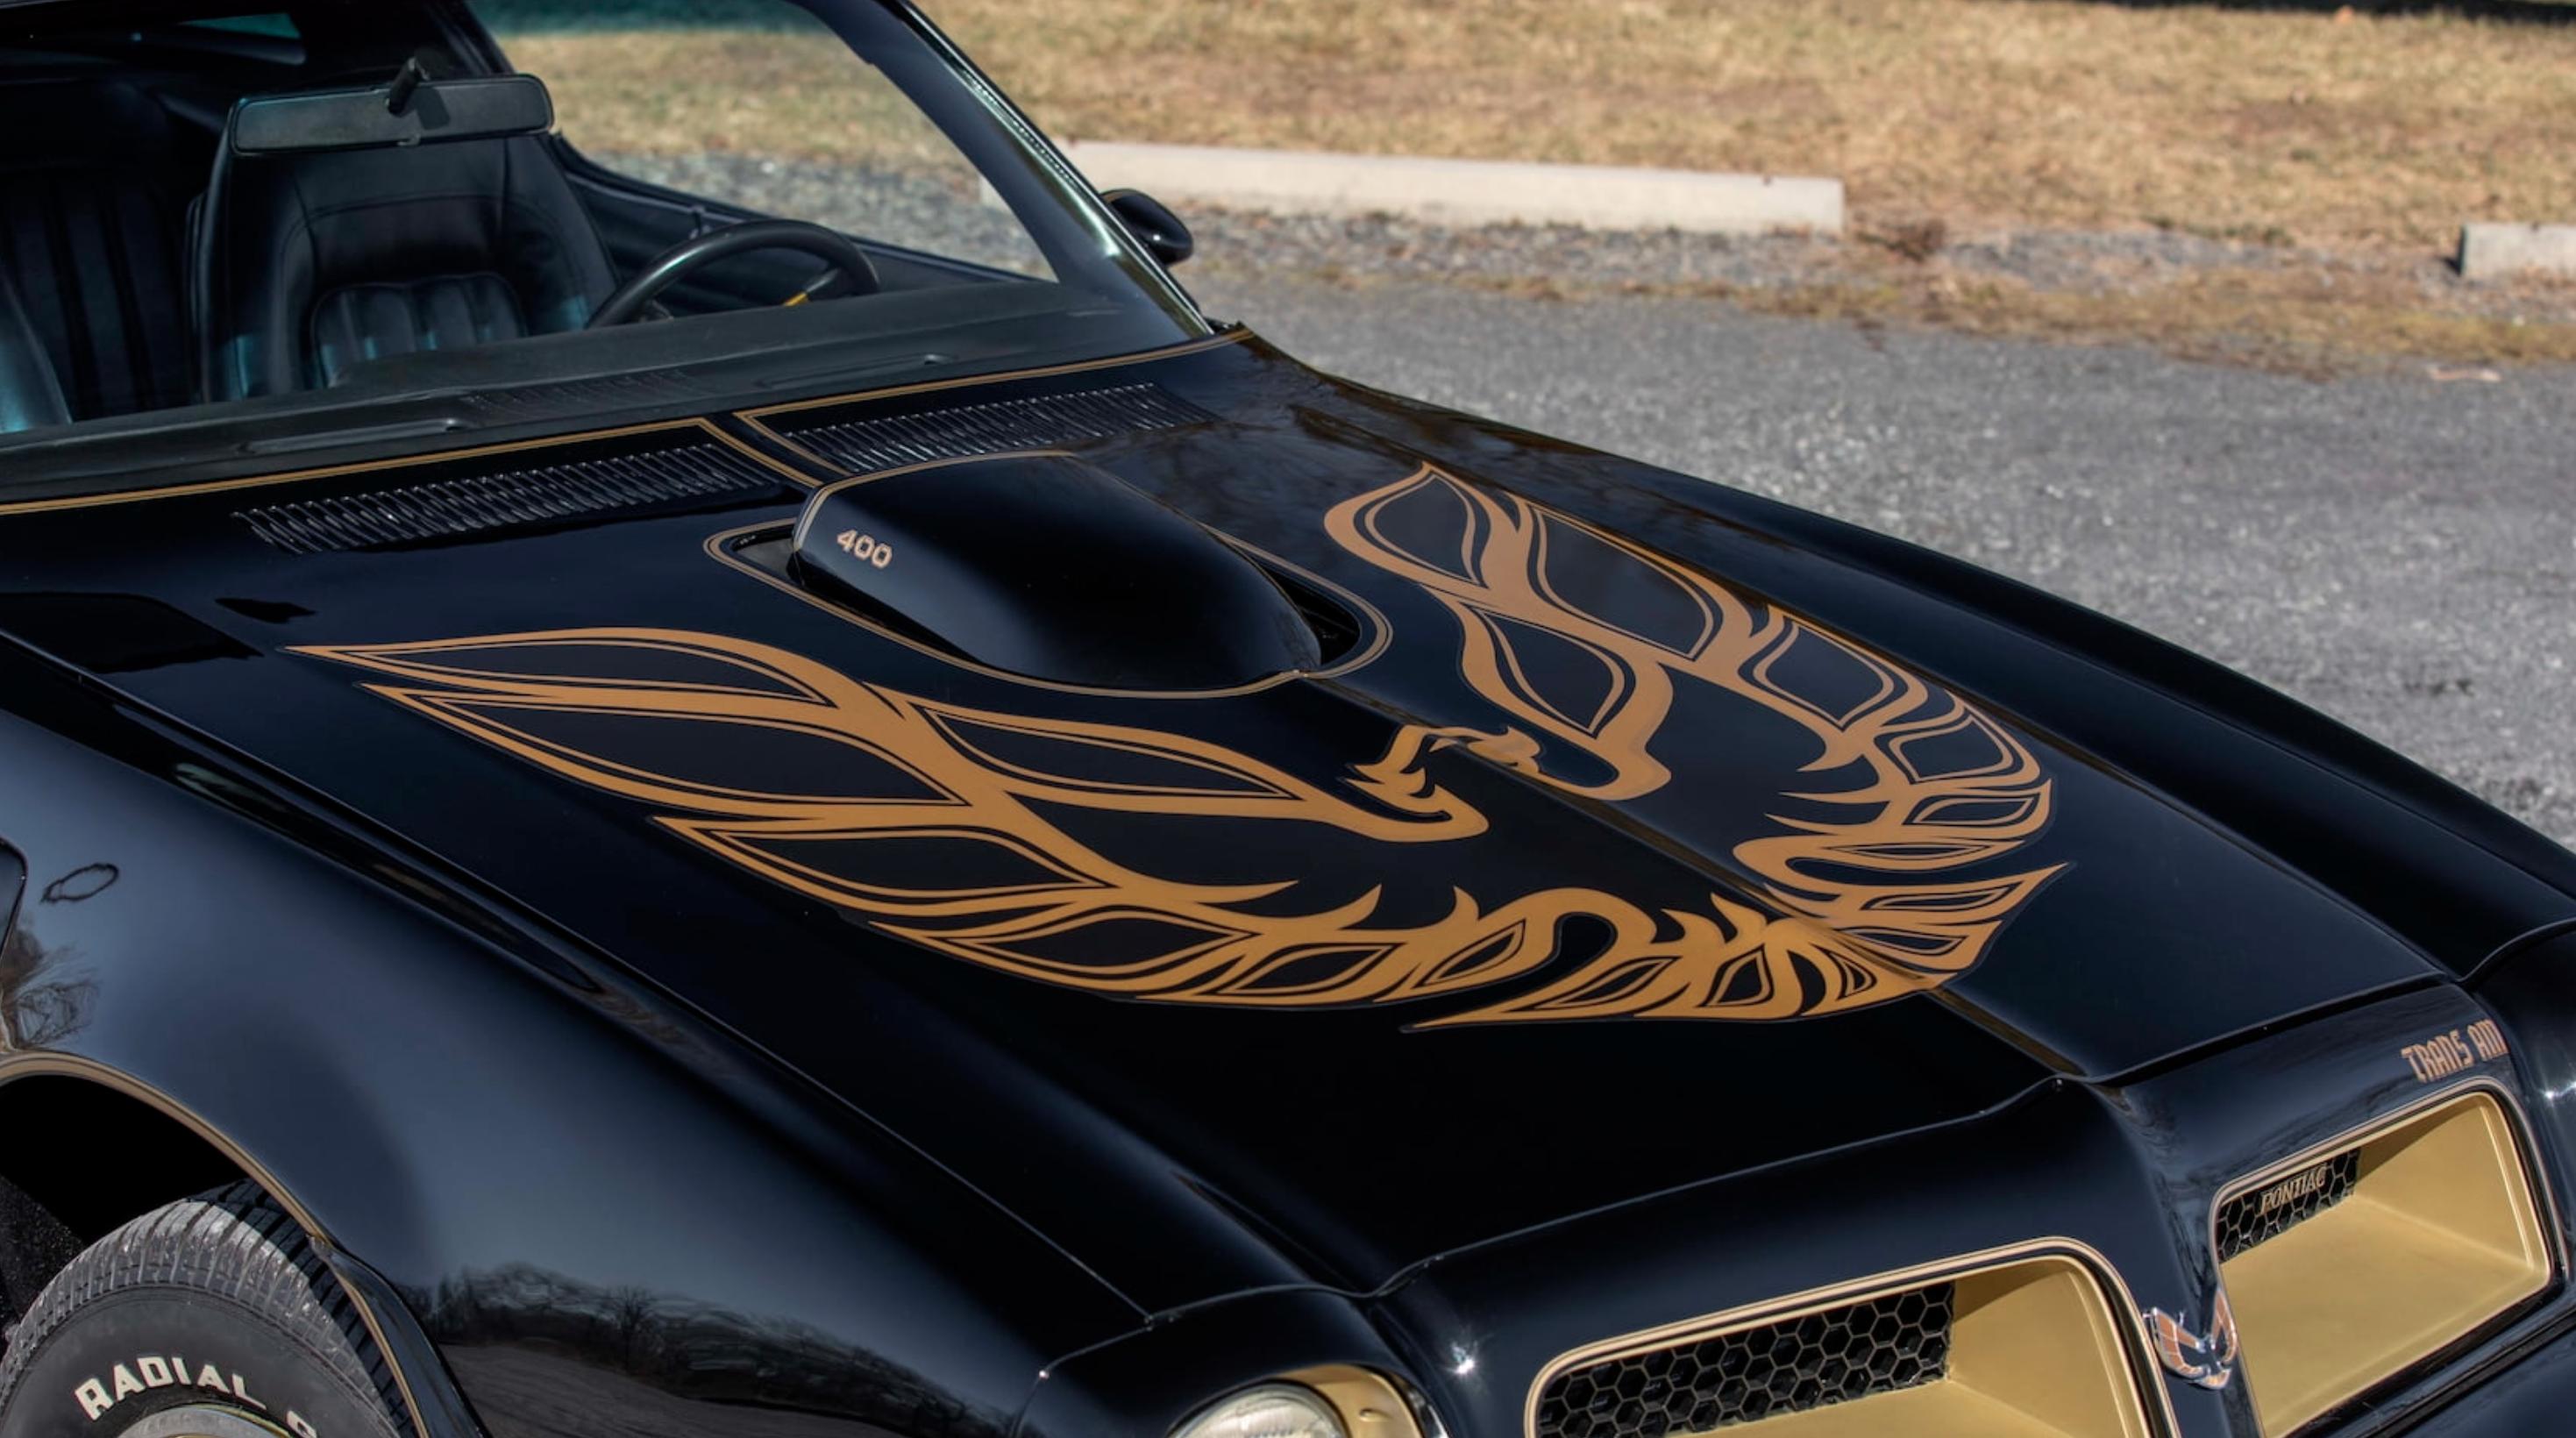 1976 Pontiac Trans Am hood